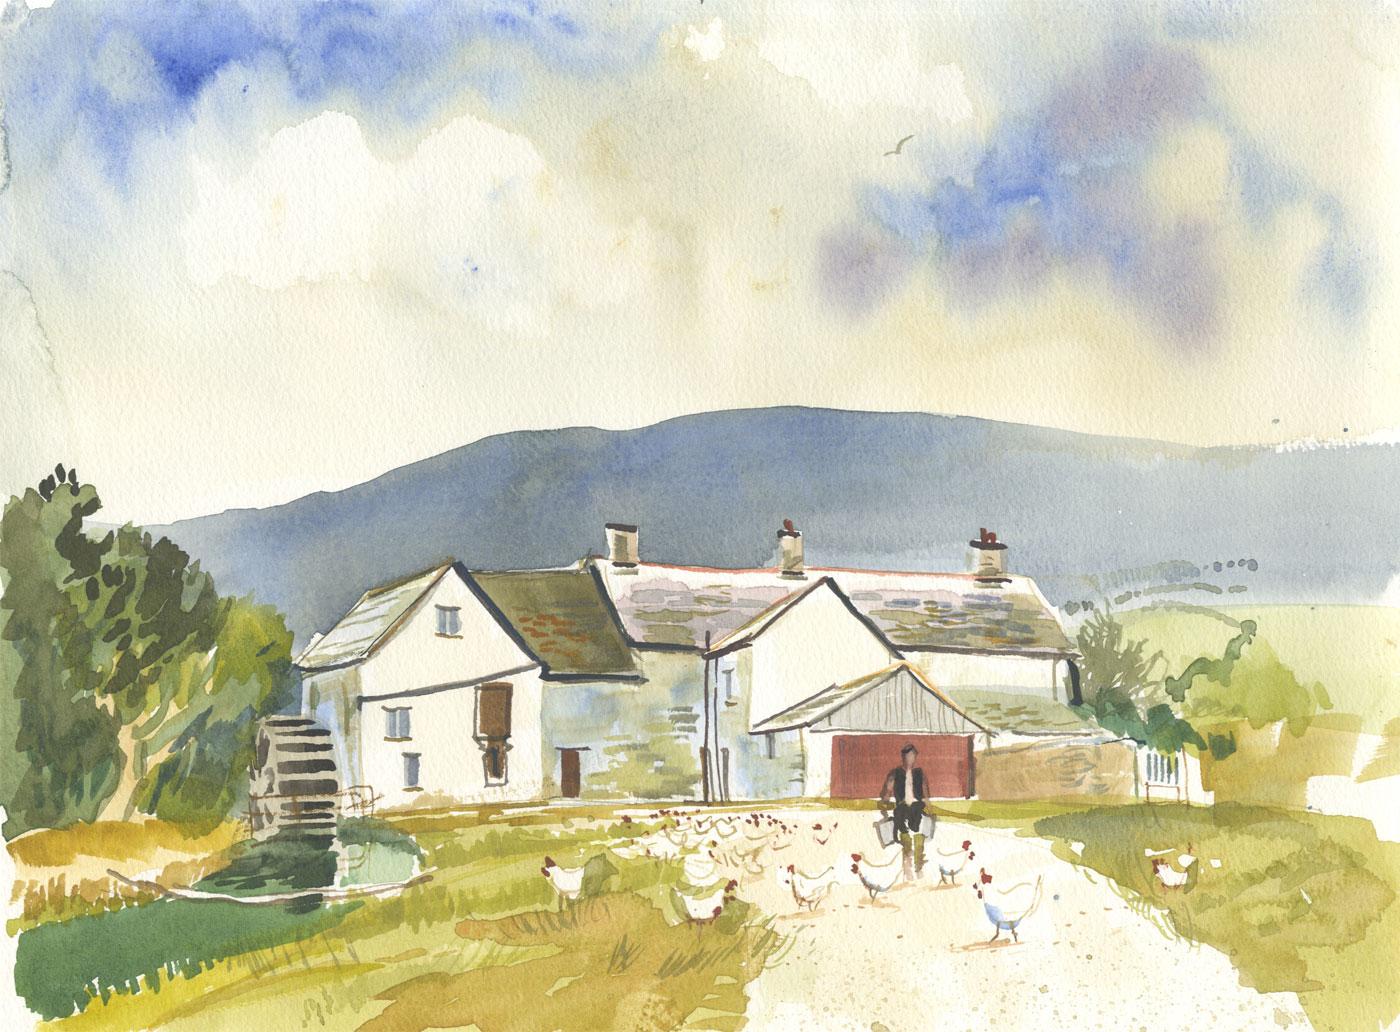 Robert T. Blayney (1929-2016) - Mid 20th Century Watercolour, Feeding Chickens